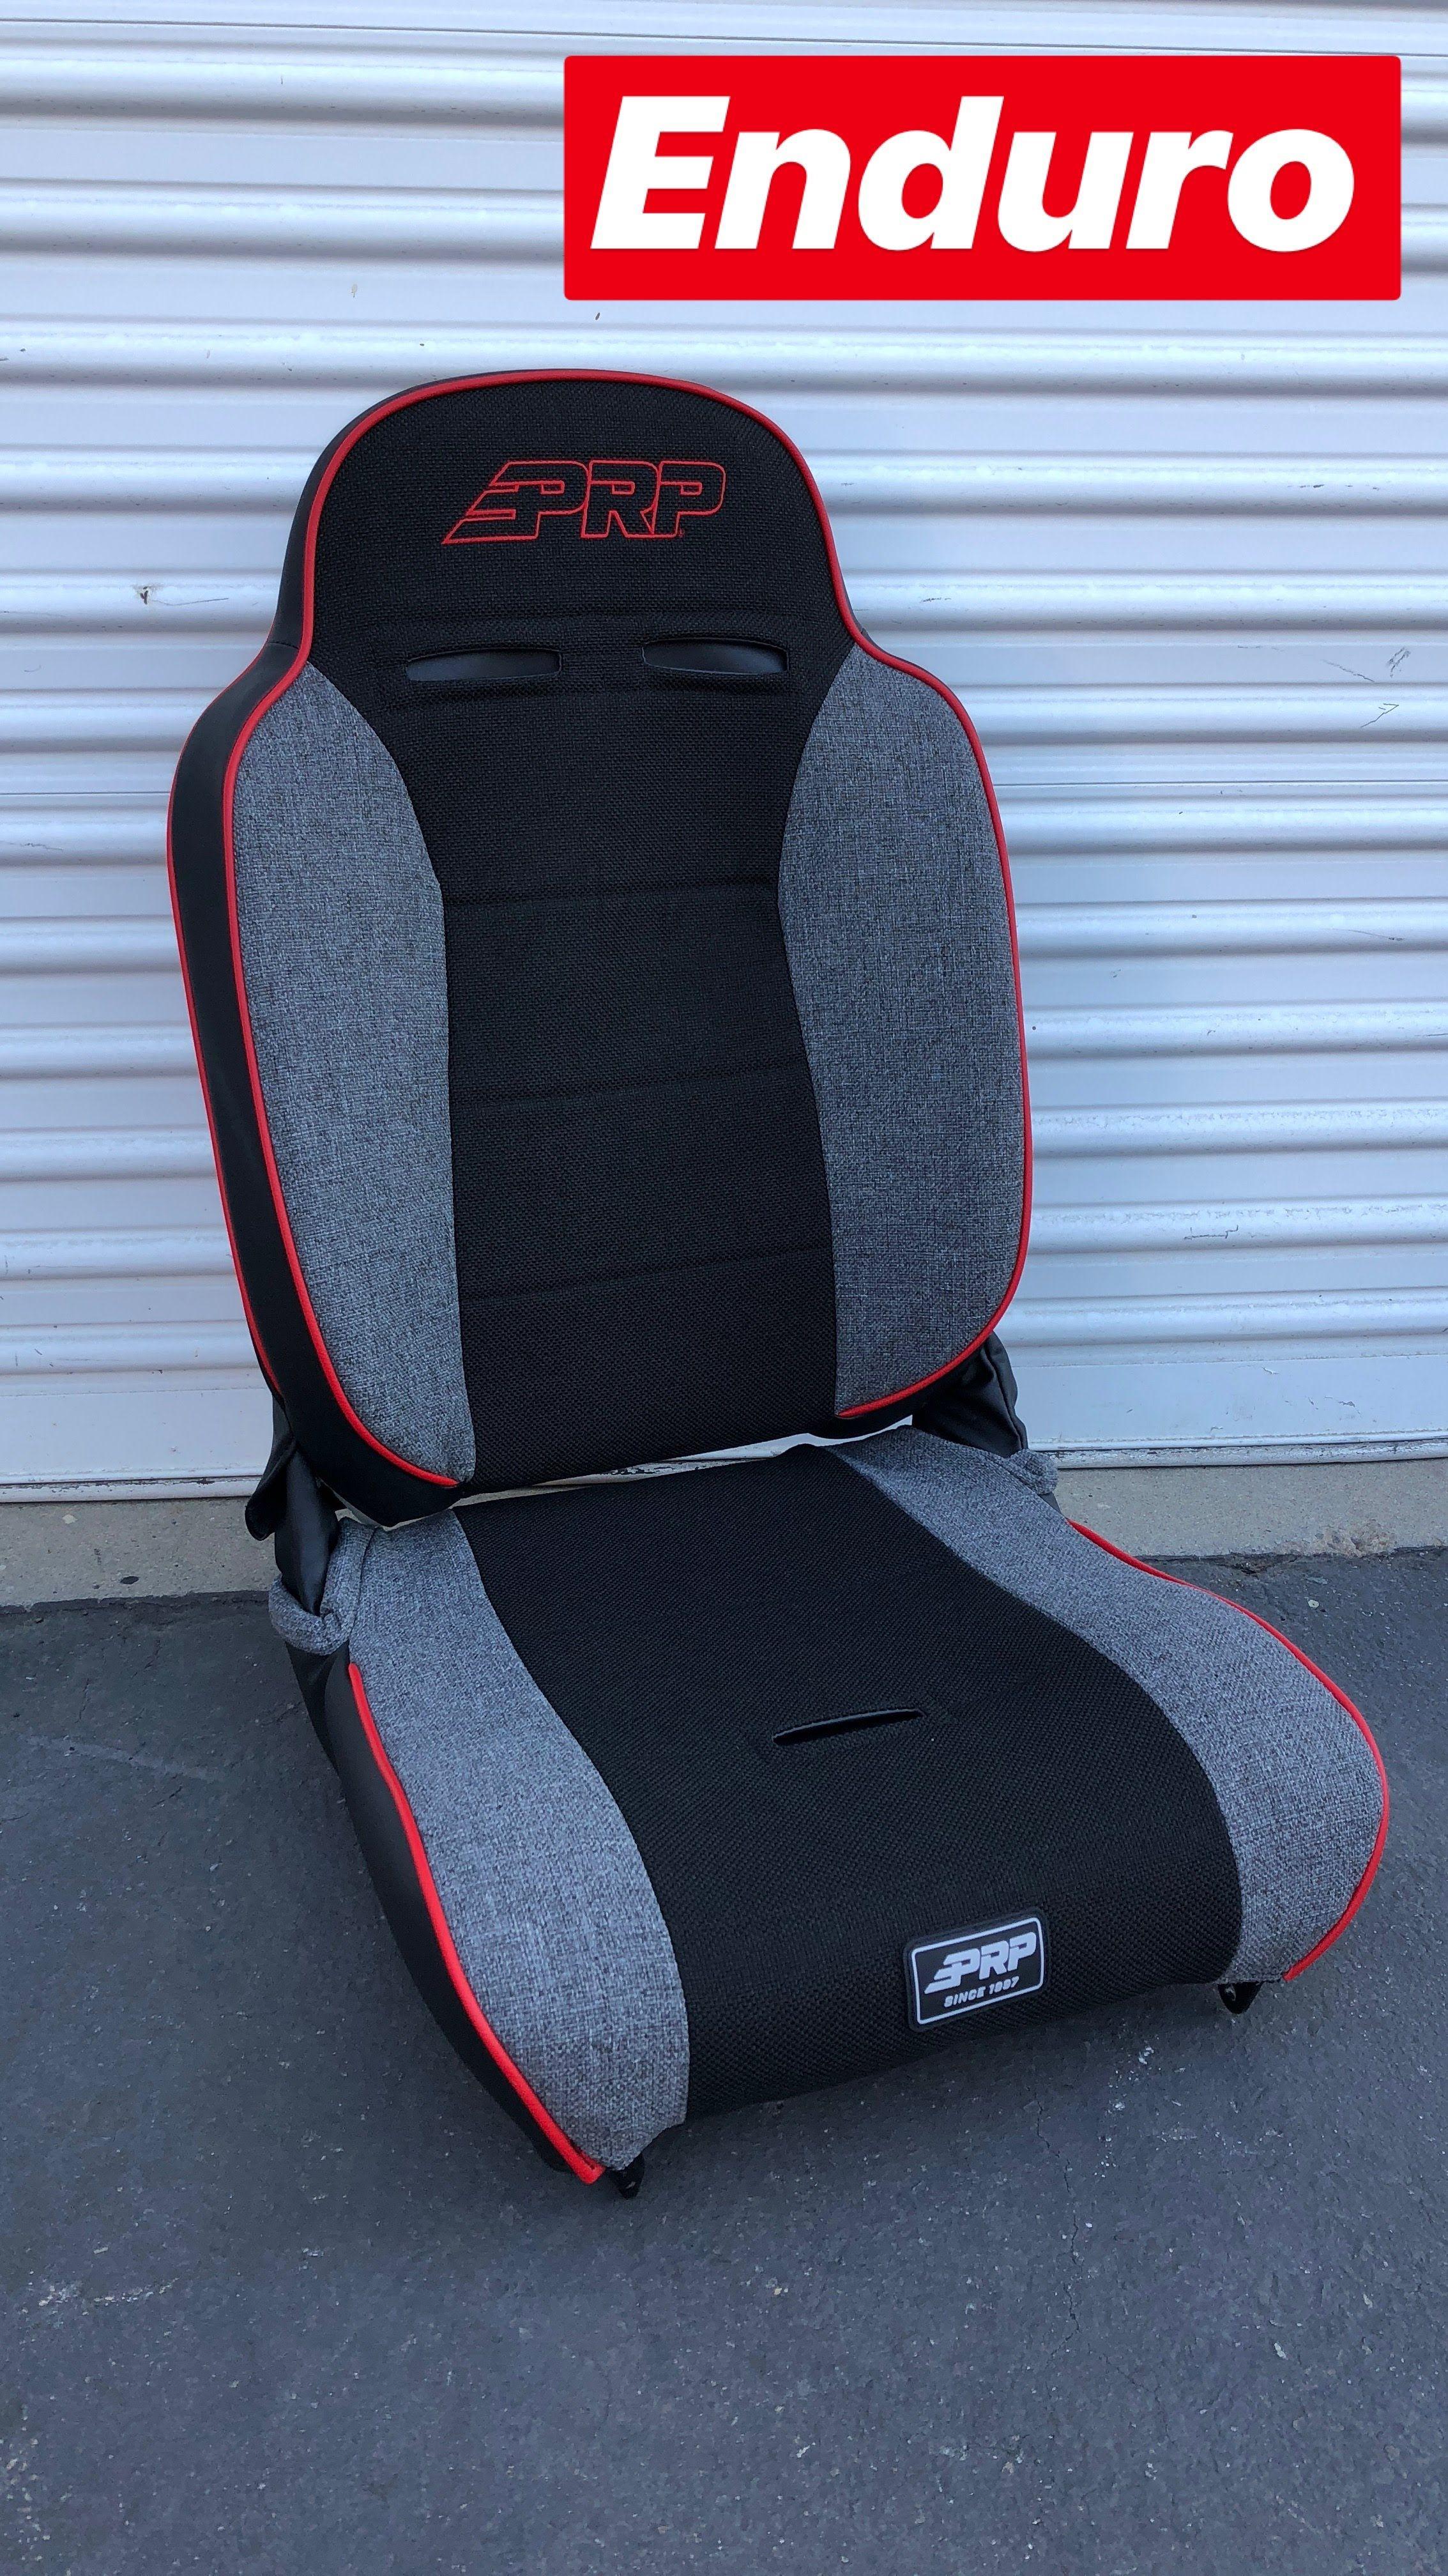 Enduro Recliner | PRP Daily Seats | Recliner, Bucket seats